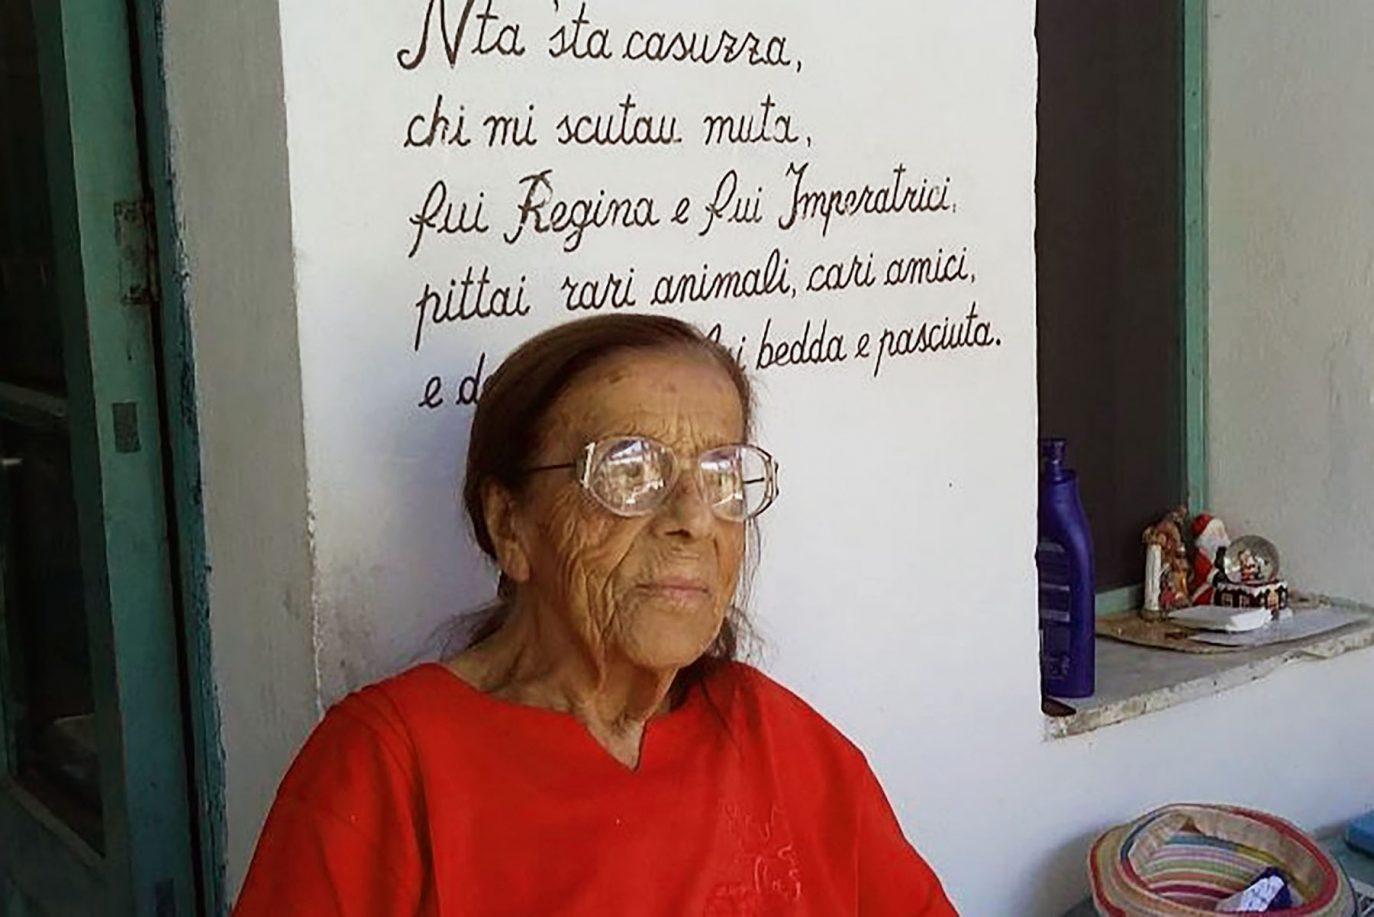 donne siciliane poetessa maria costa